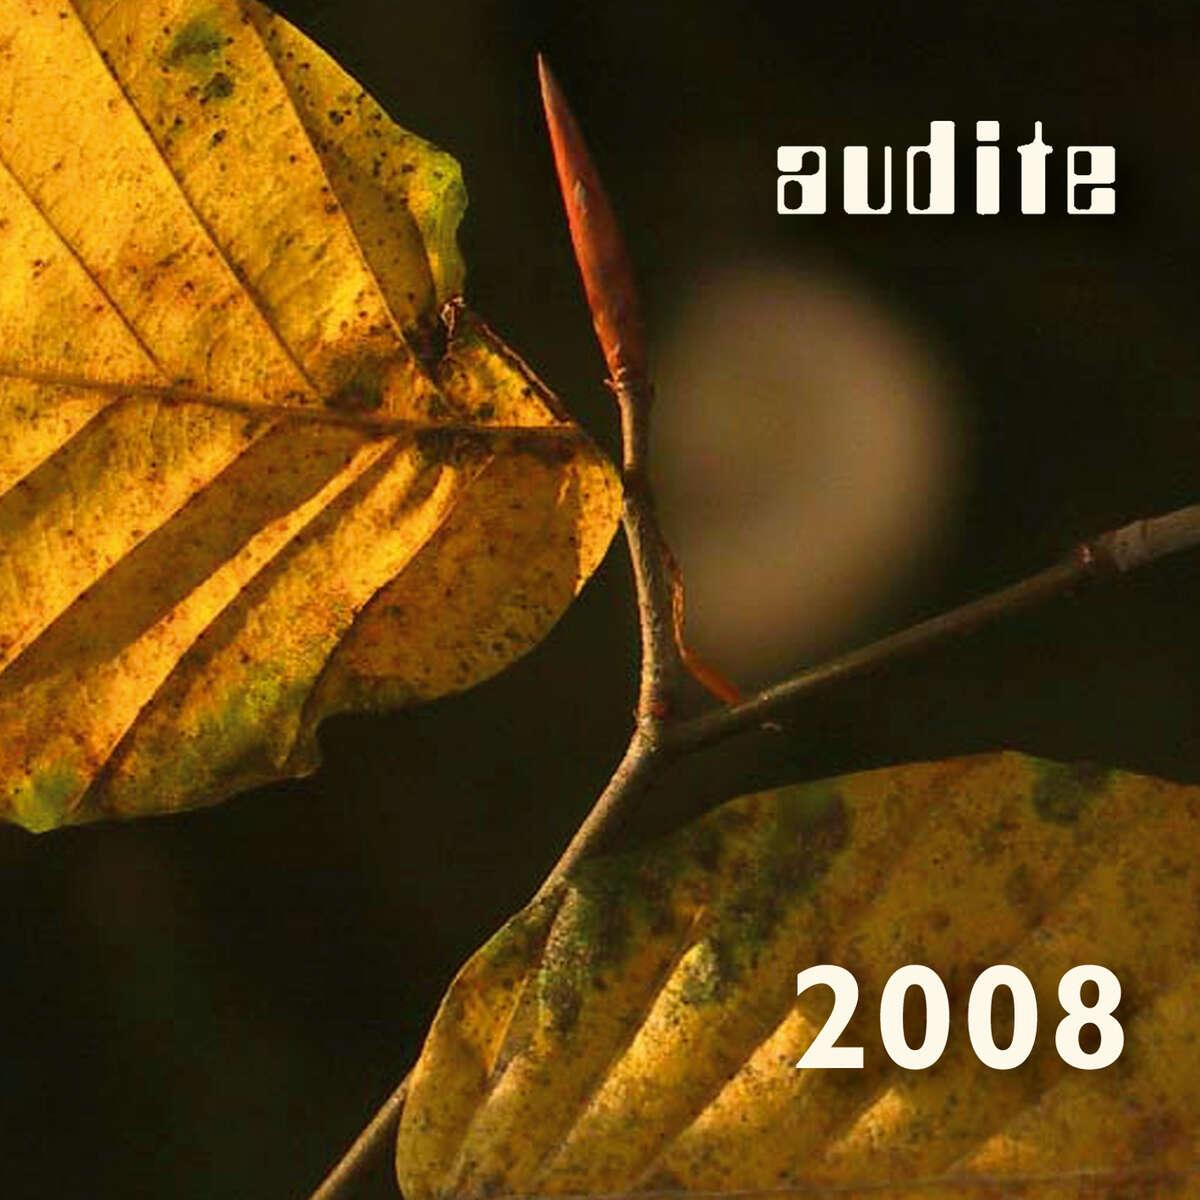 audite catalogue 2008 & CD - Tchaikovsky: Symphony 5 & Schumann: Piano Concerto